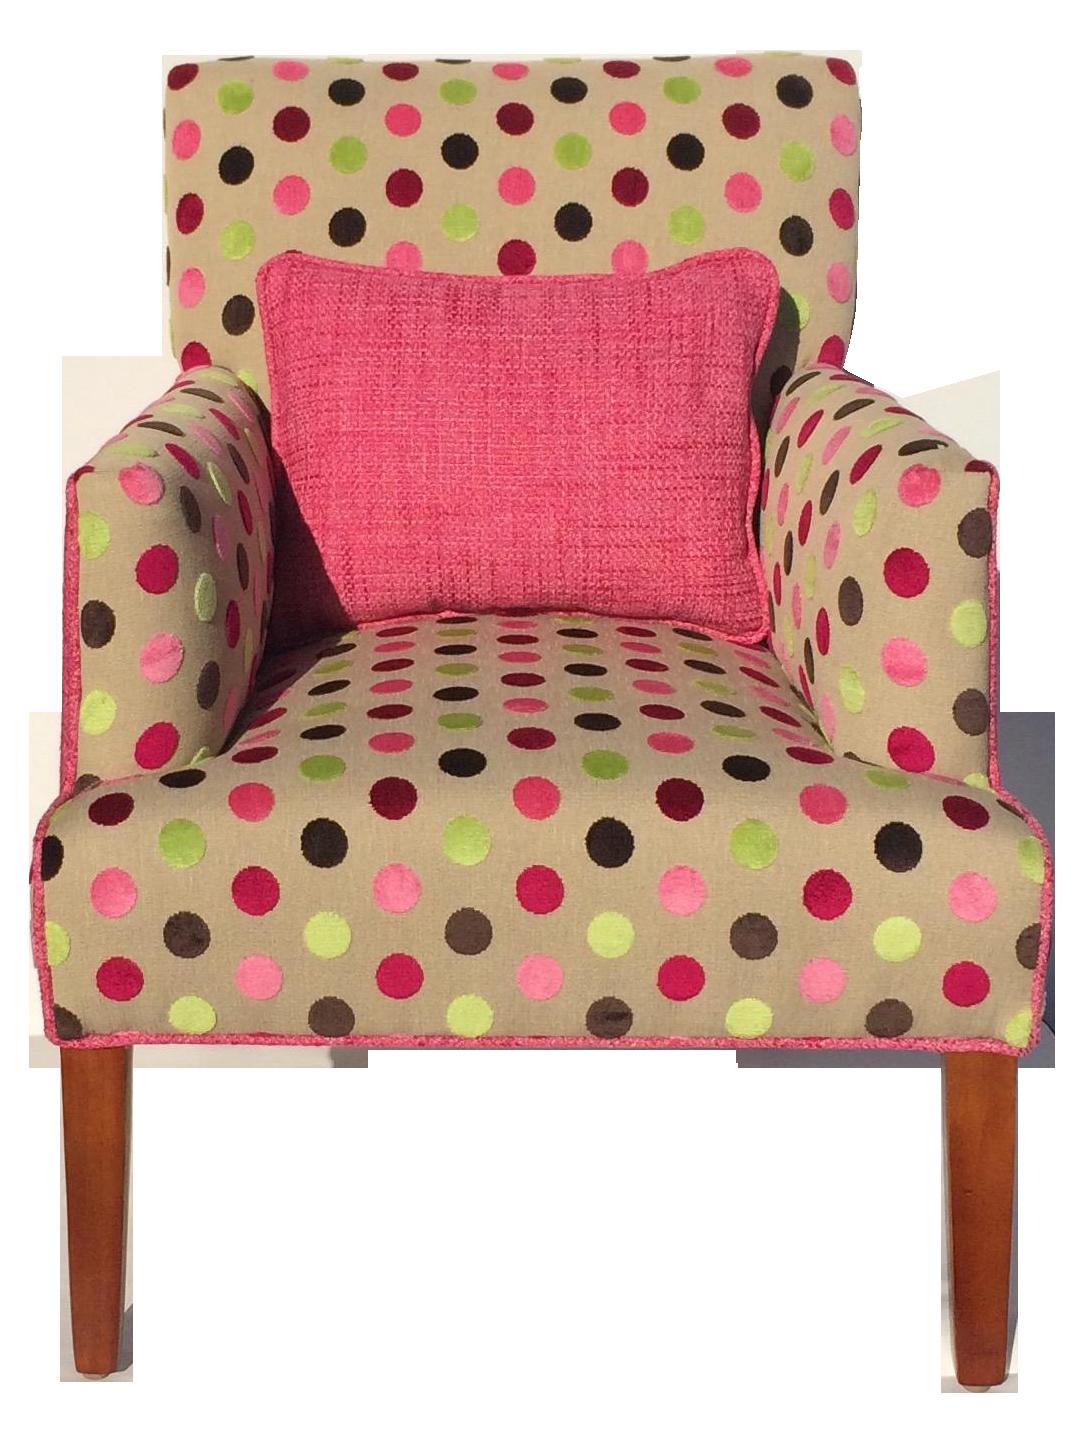 Pink Chenille Polka Dot Upholstered Chair | Chairish